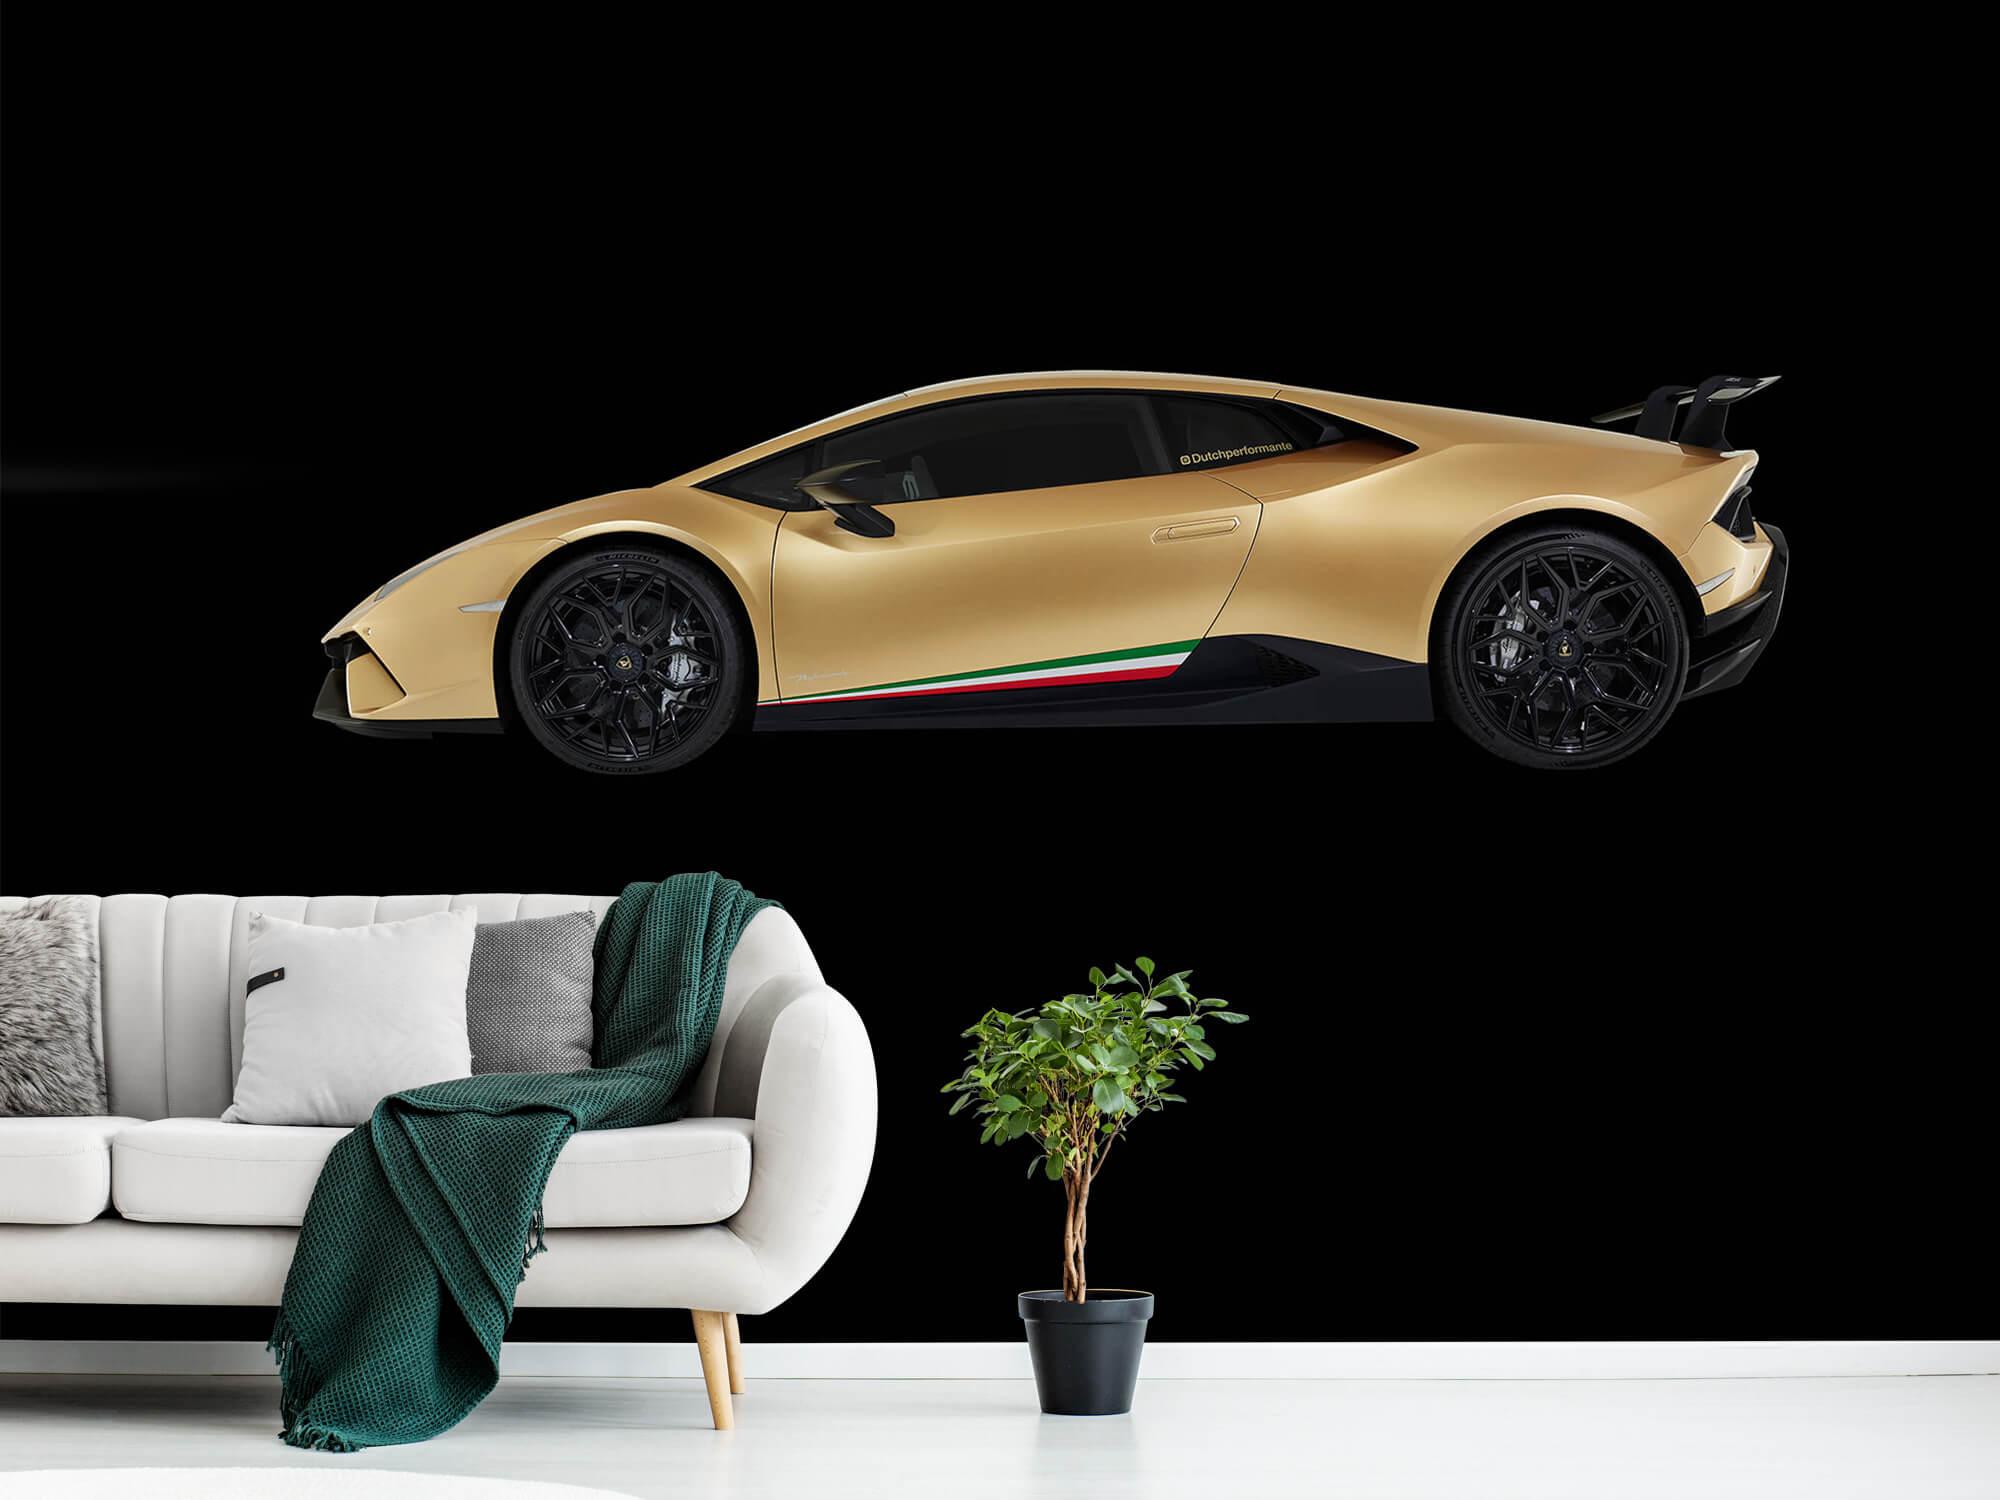 Wallpaper Lamborghini Huracán - Zijkant, zwart 13